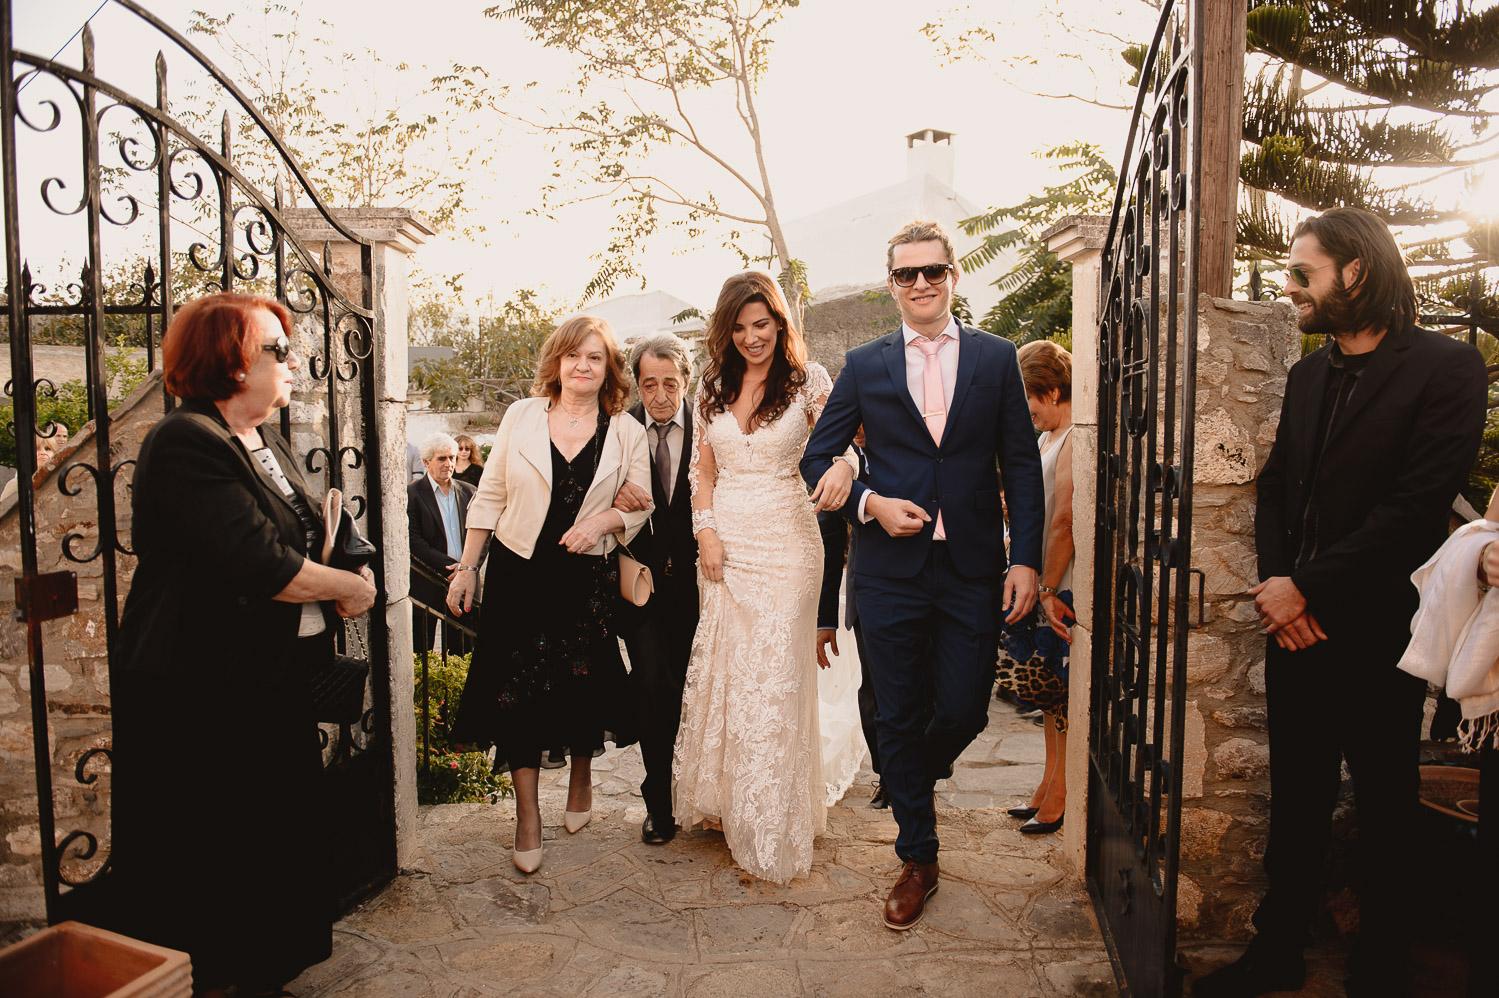 Fotoplano φωτογράφιση γάμου Ηράκλειο Κρήτη